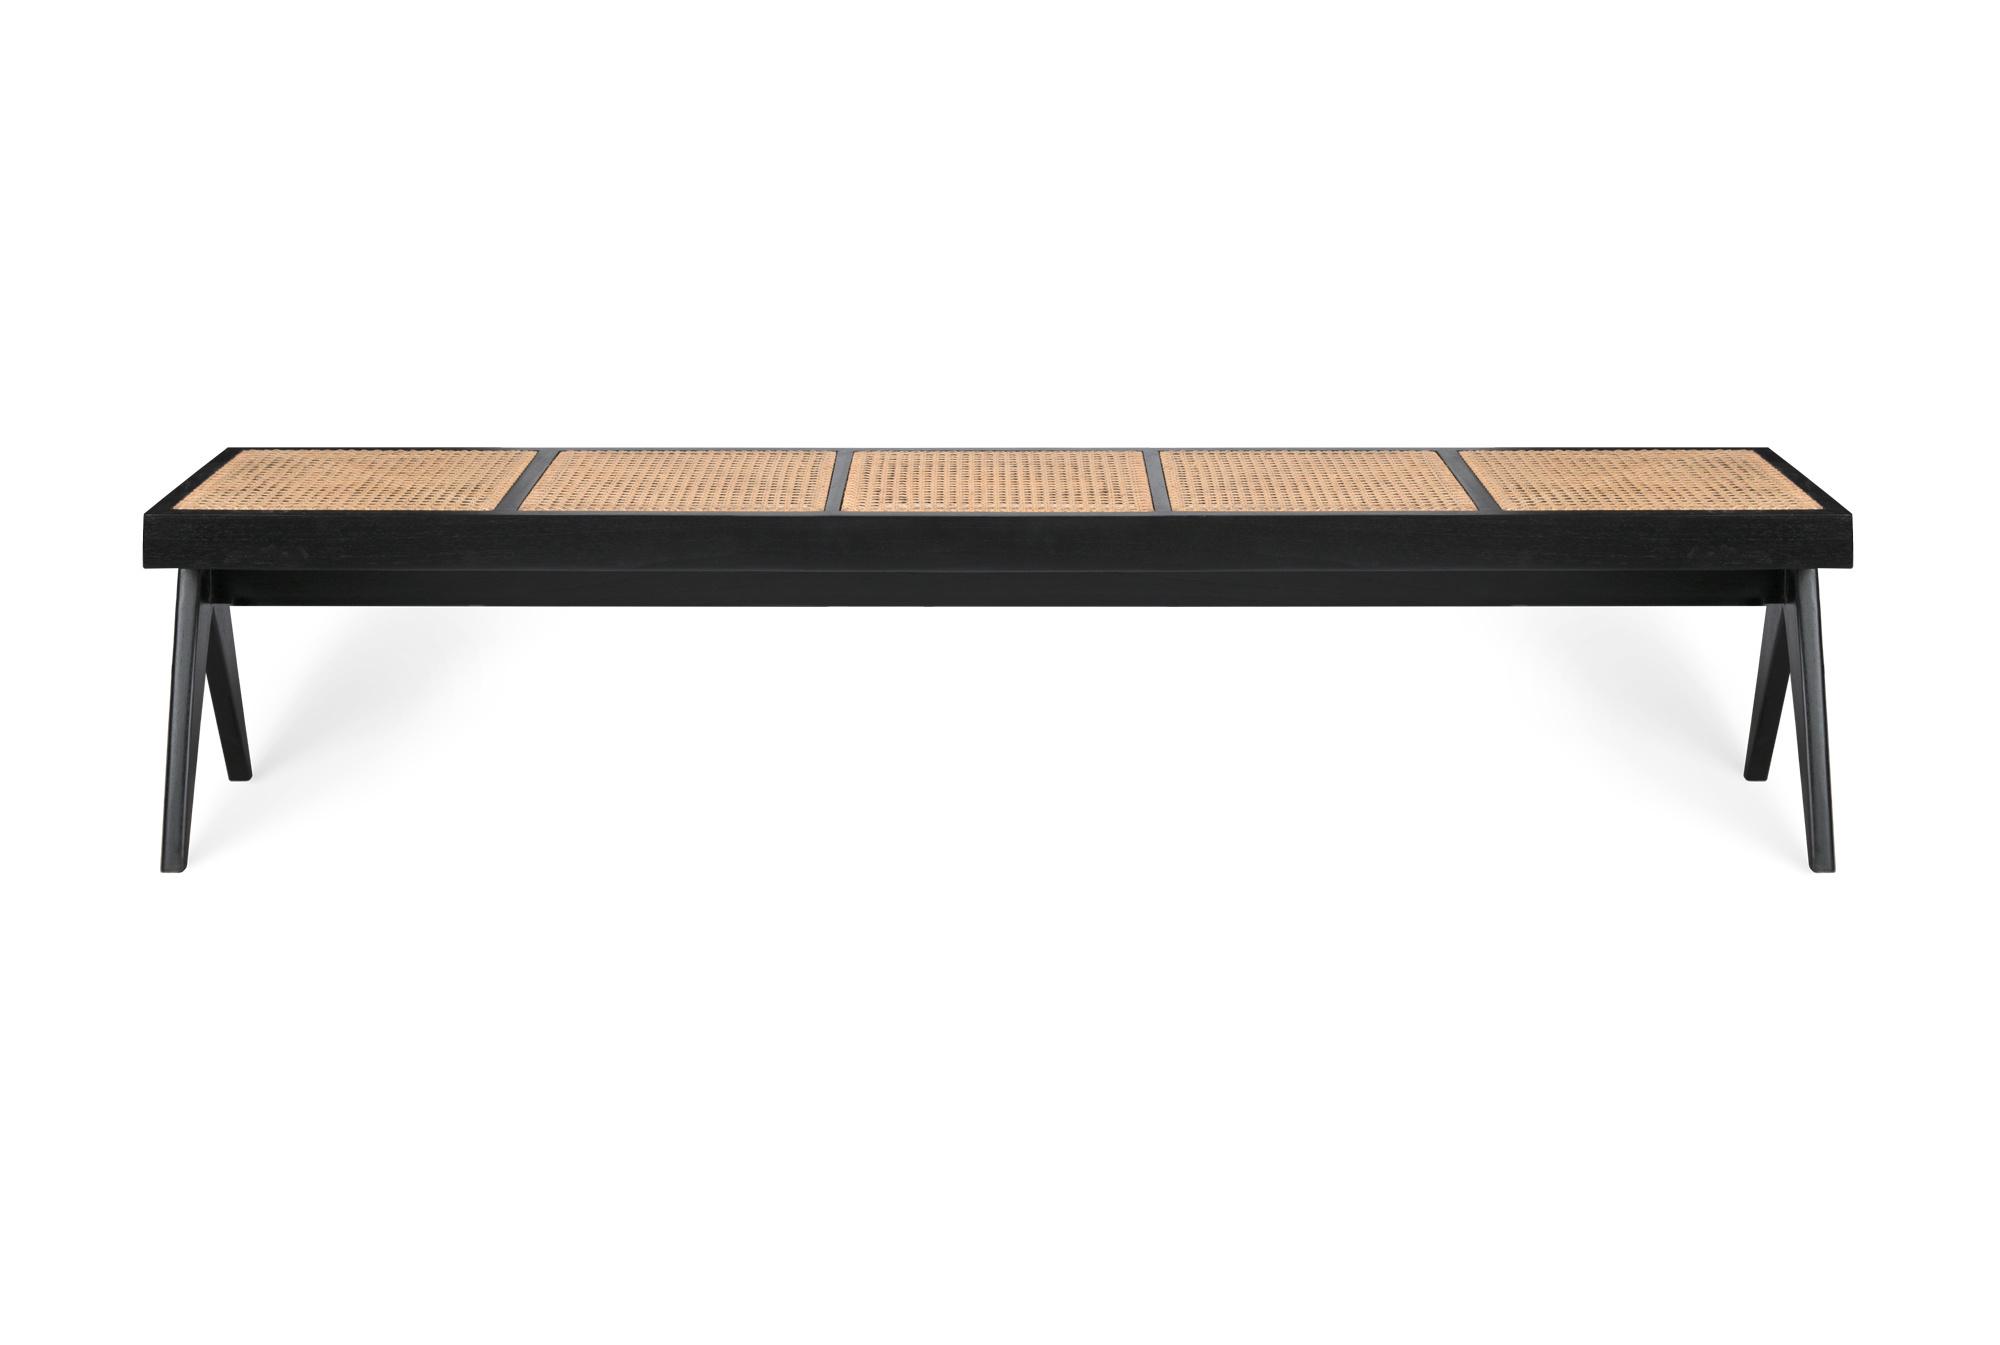 Bench / B.T.H. Flats 5-2